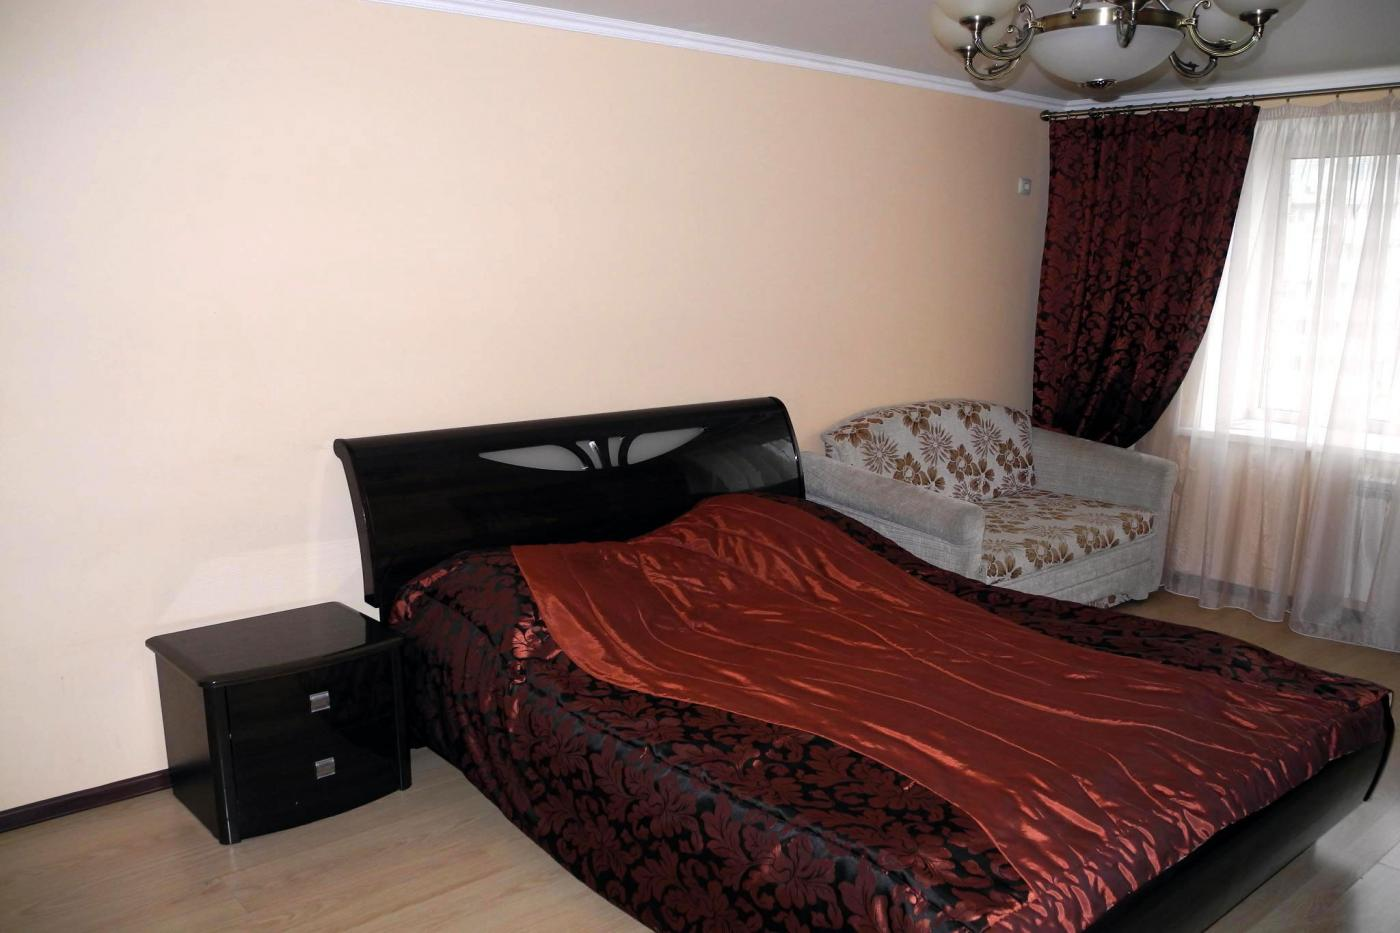 2-комнатная квартира посуточно (вариант № 3876), ул. Войкова улица, фото № 5